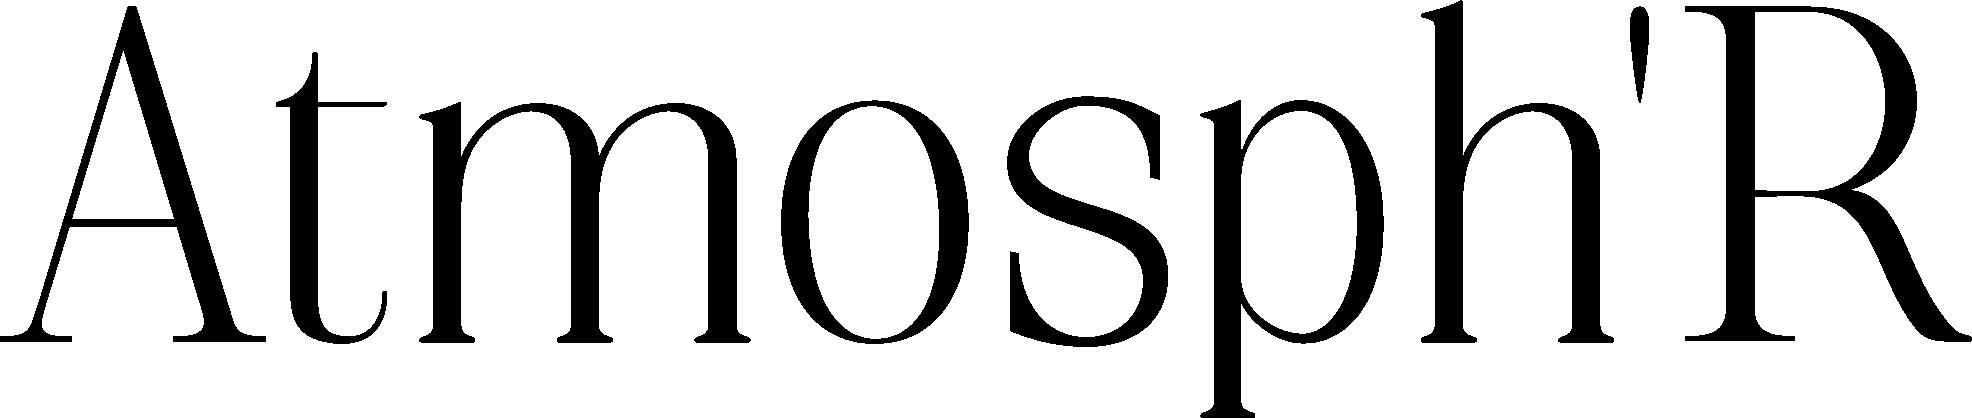 AtmoshphR_Logo